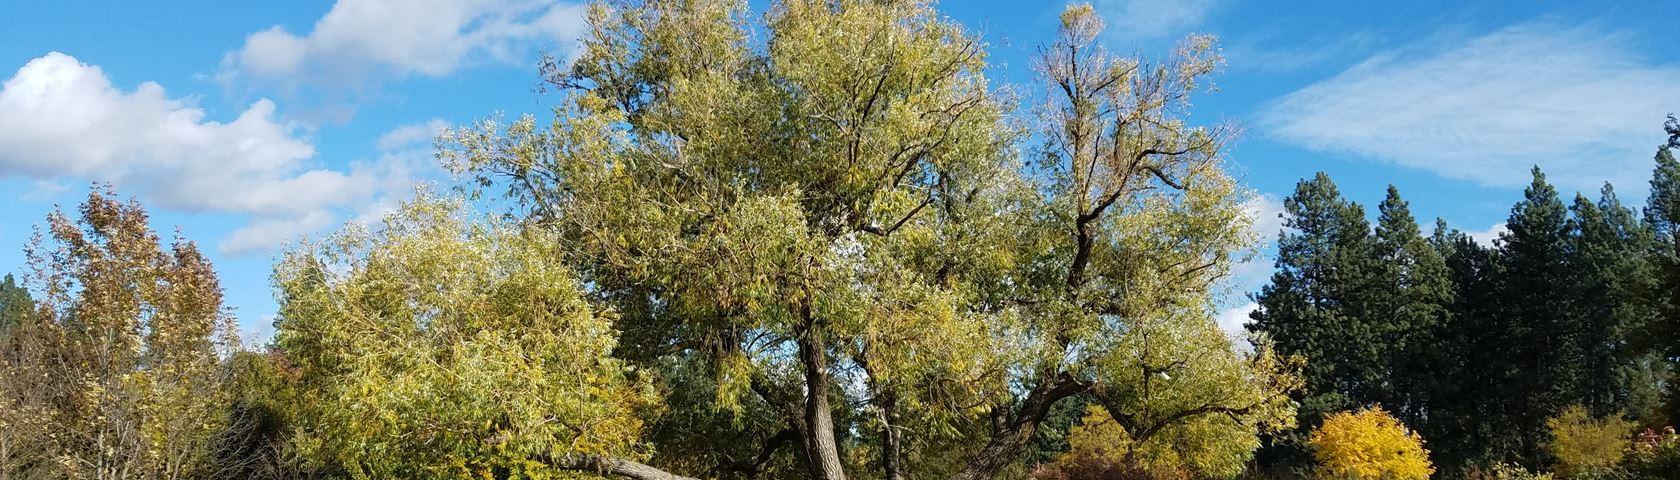 Fall White Willow